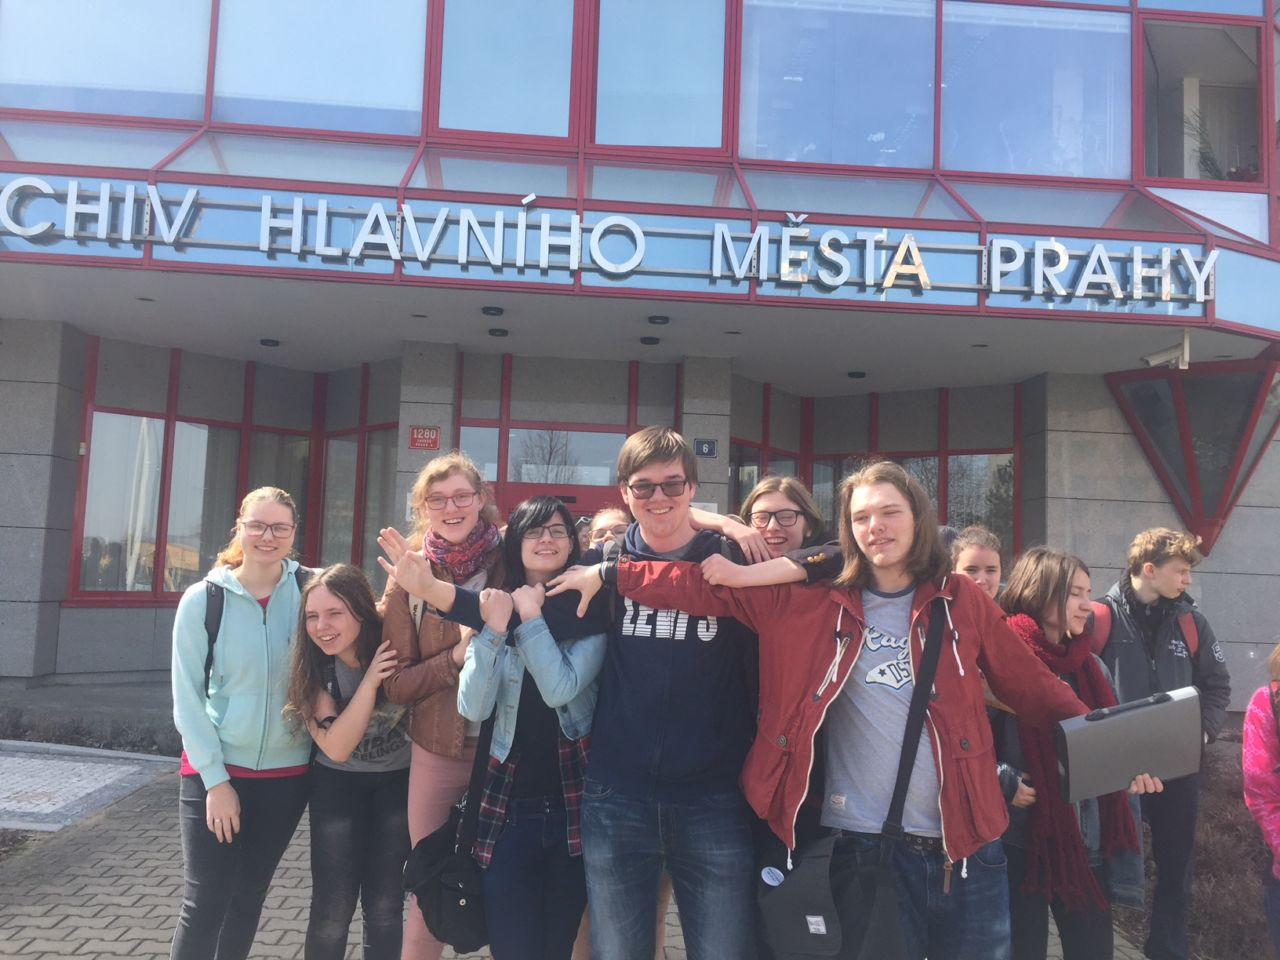 Exkurze do Archivu hl. m. Prahy